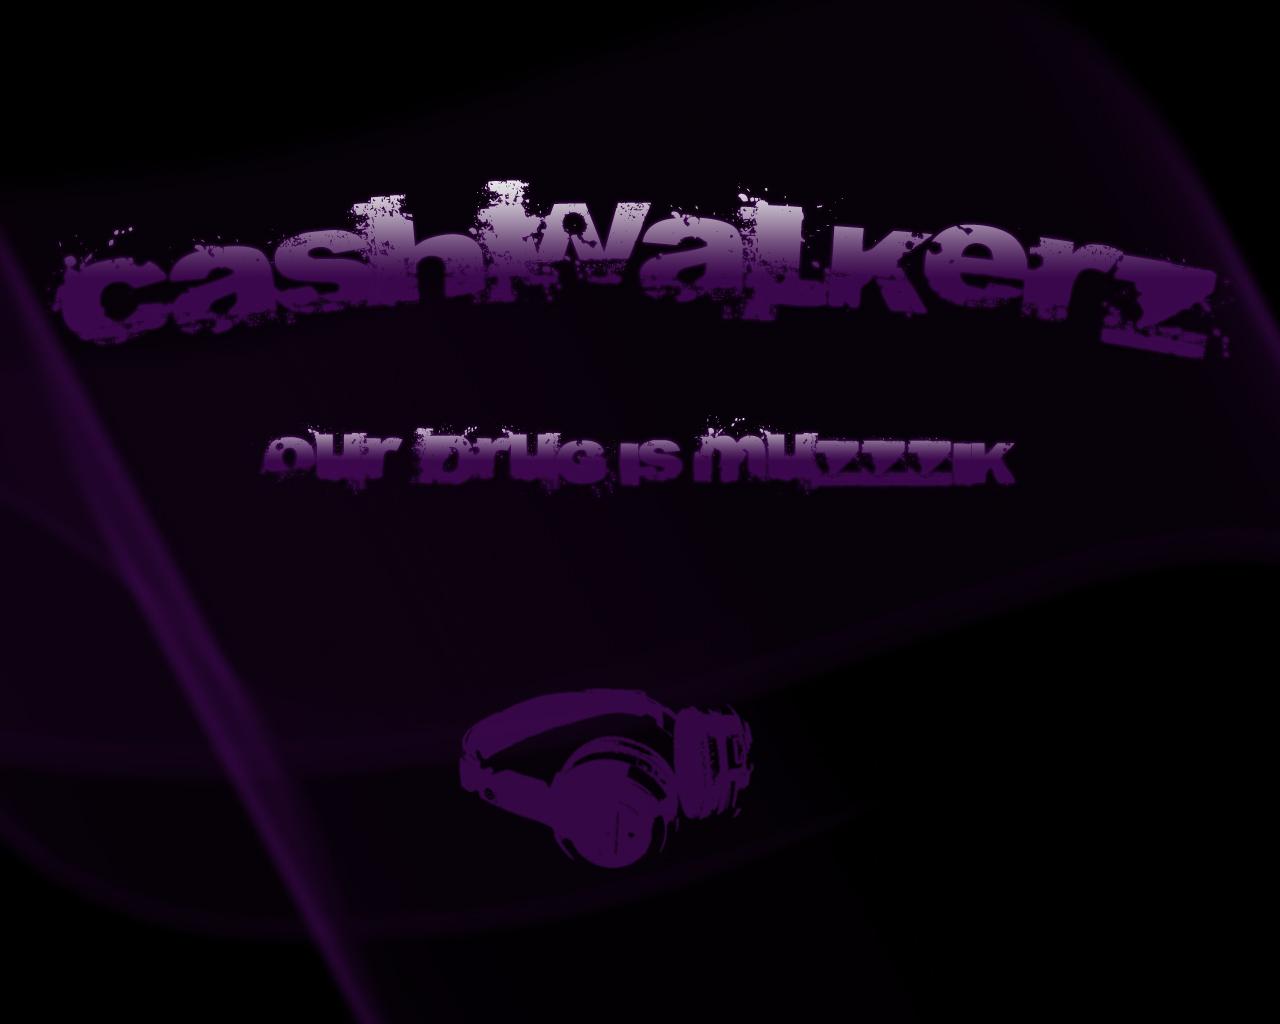 http://3.bp.blogspot.com/_EvfT6sc-_y0/TRCrbw_BEHI/AAAAAAAAADQ/OwvdAzFqHuc/s1600/NEUES%2BDESIGN%2B2010%2B%25281280%2Bx%2B1024%2529.jpg